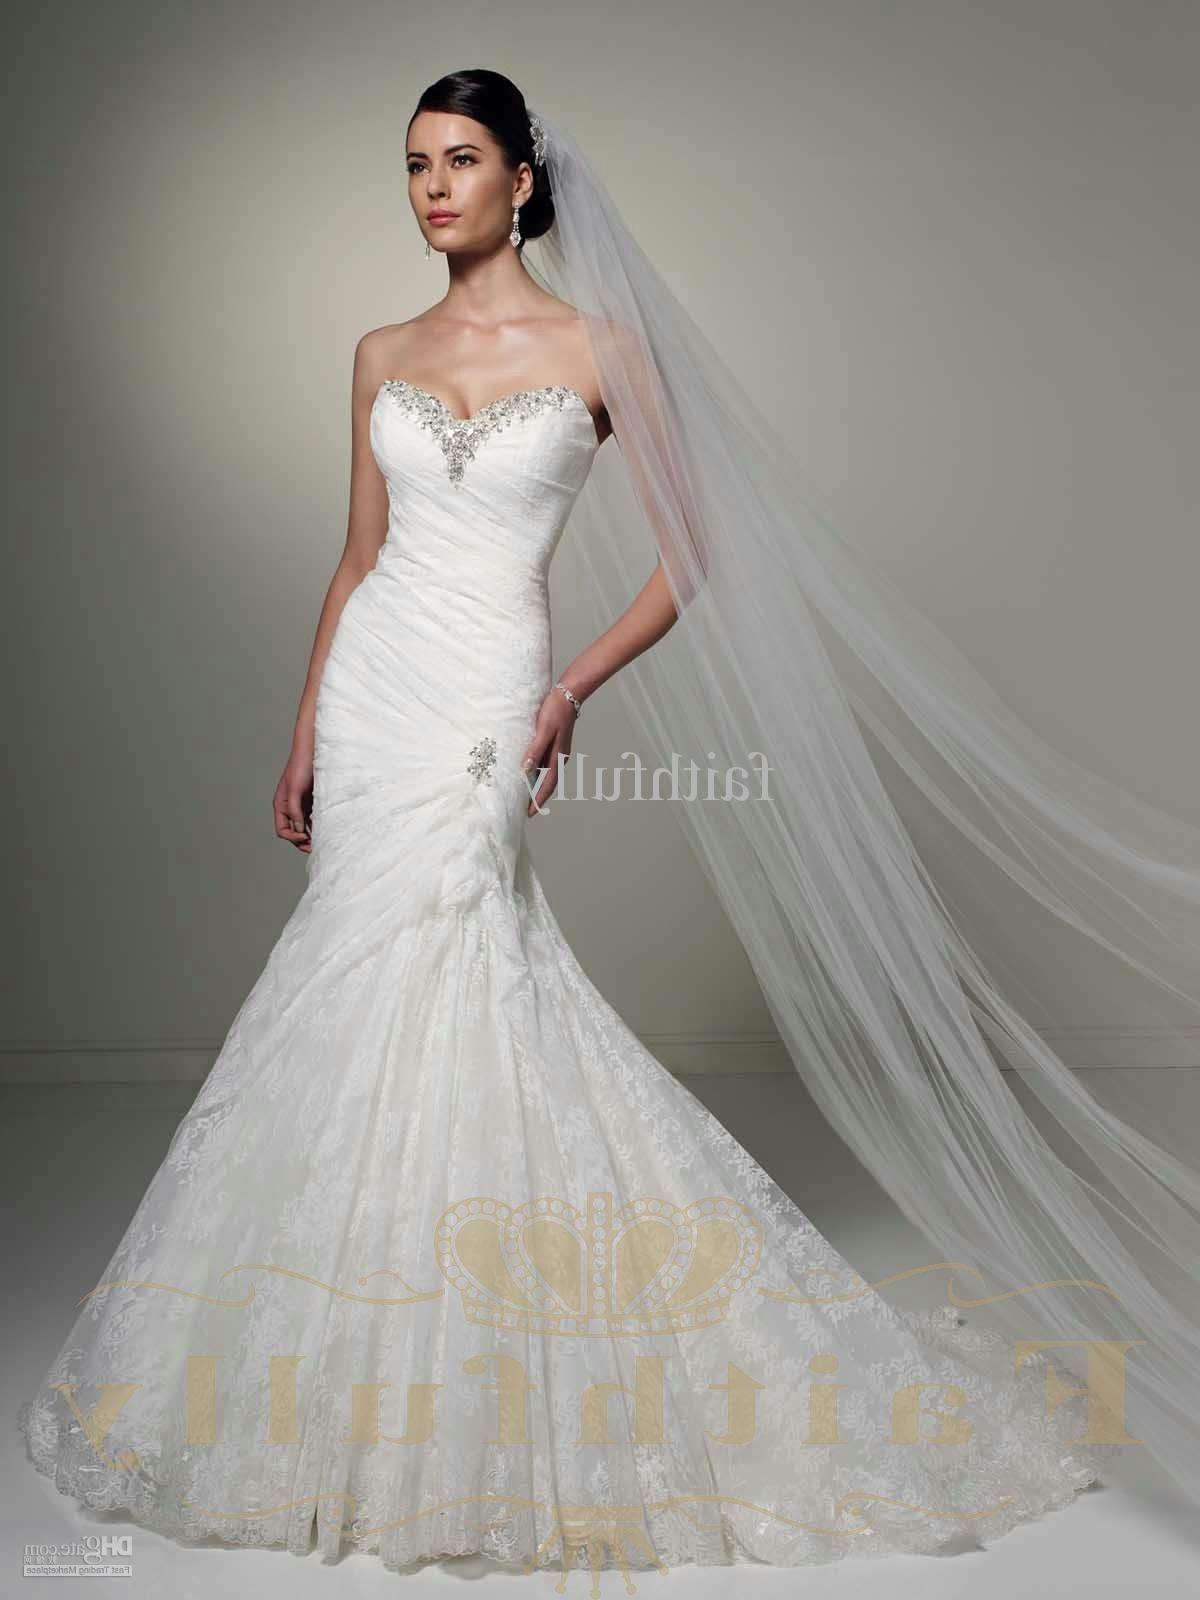 Trumpet Wedding Dress With Corset Back [ 1600 x 1200 Pixel ]